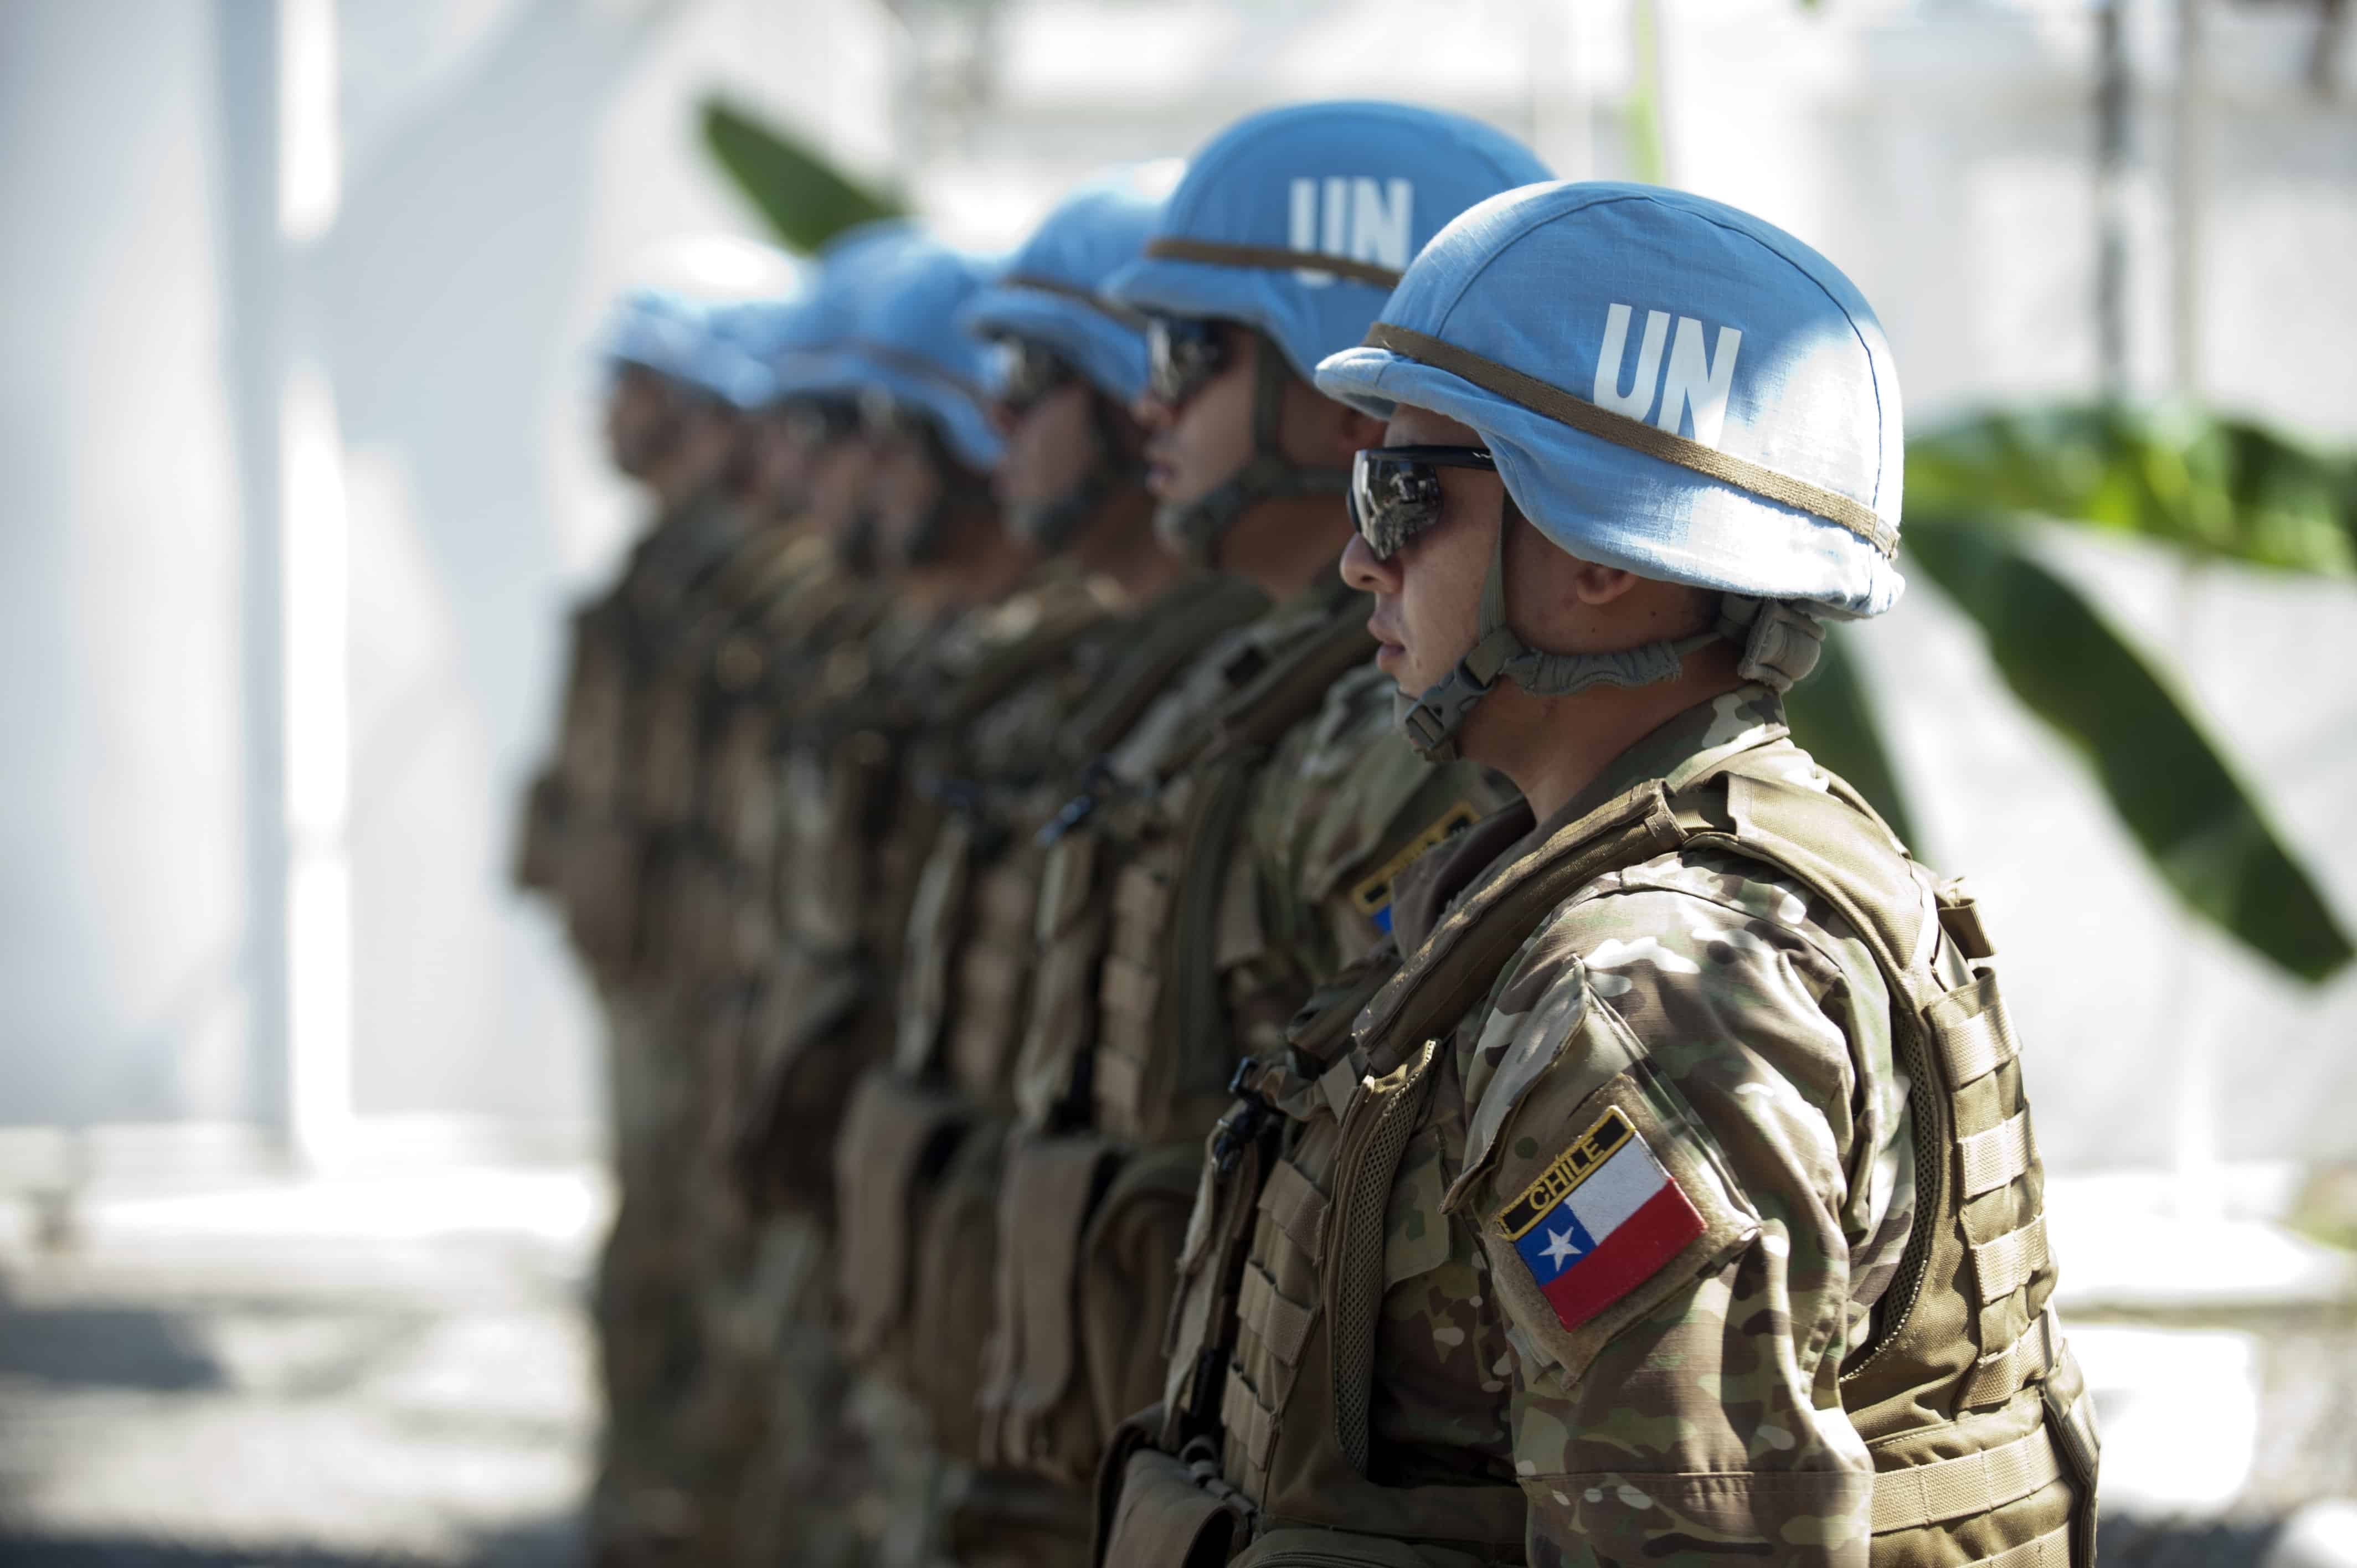 The United Nations Stabilization Mission in Haiti (MINUSTAH) in Cap-Haitien, Haiti.